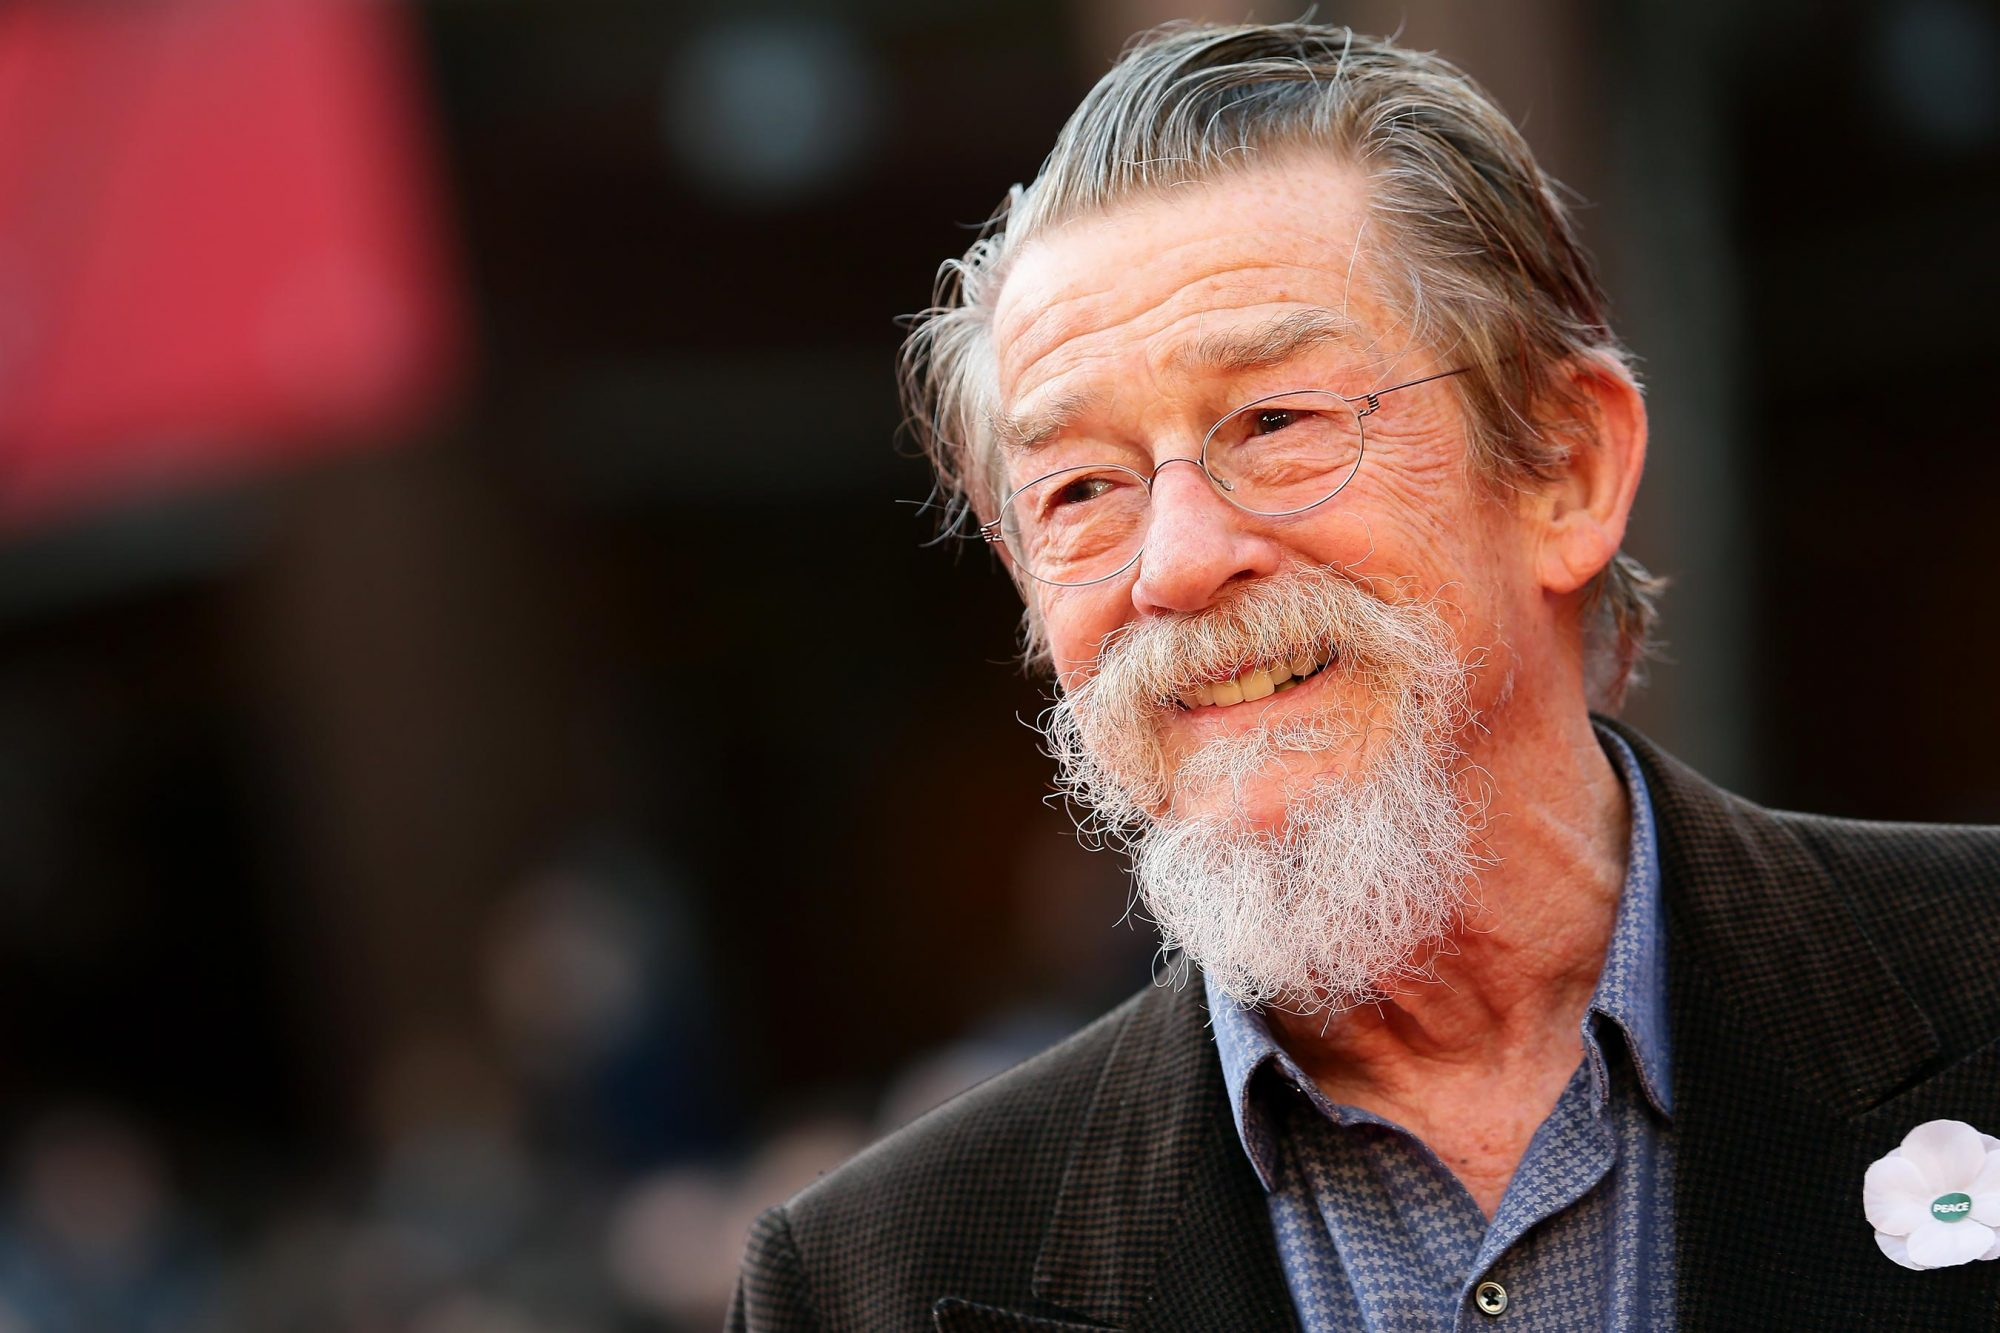 John Hurt On The Red Carpet - The 8th Rome Film Festival